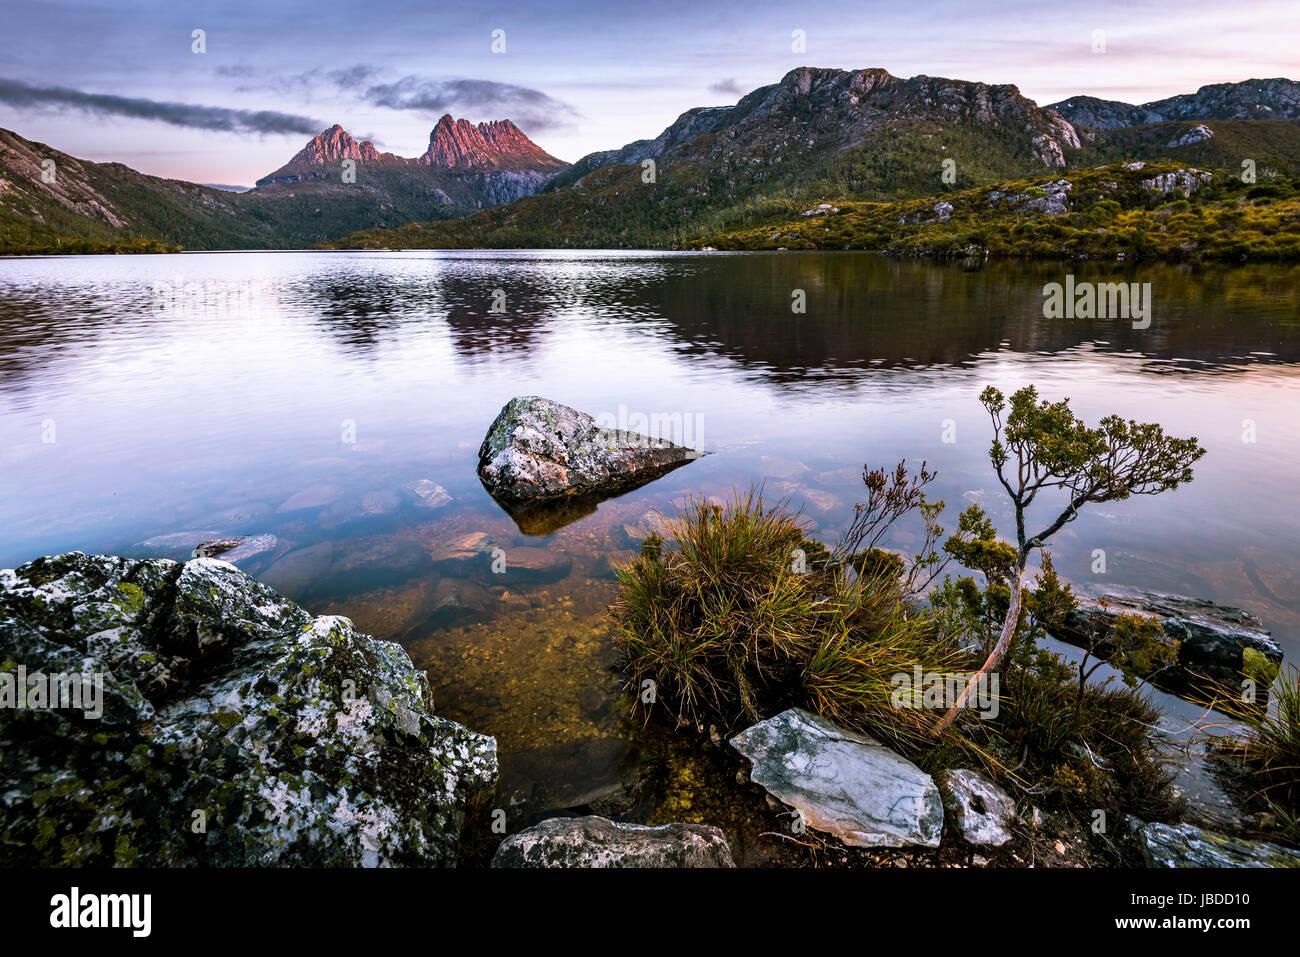 Cradle Mountain, Cradle Mountain-Lake St Clair National Park, Tasmania - Stock Image